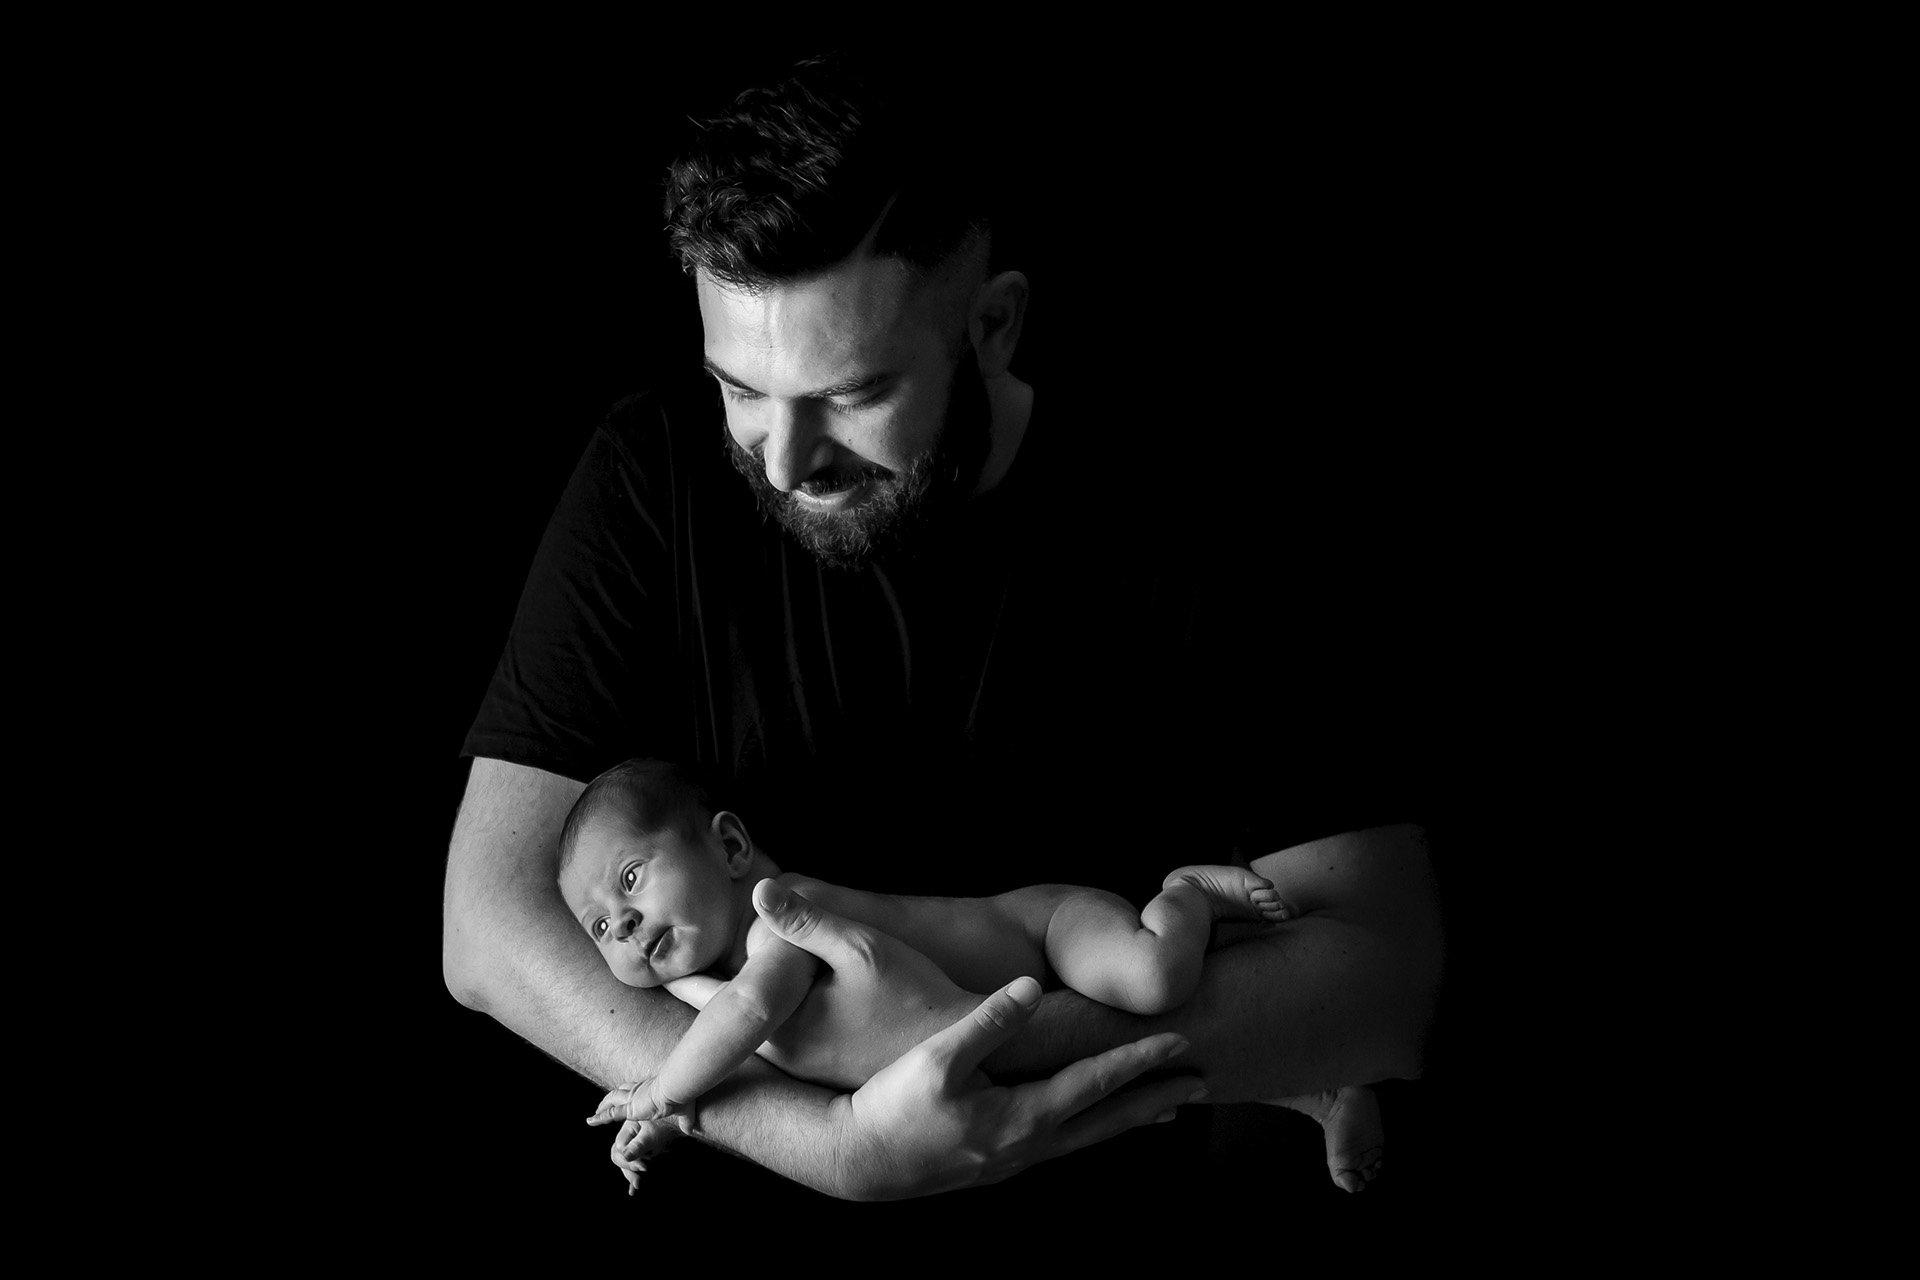 fotografo book newborn neonati bianconero alain battiloro